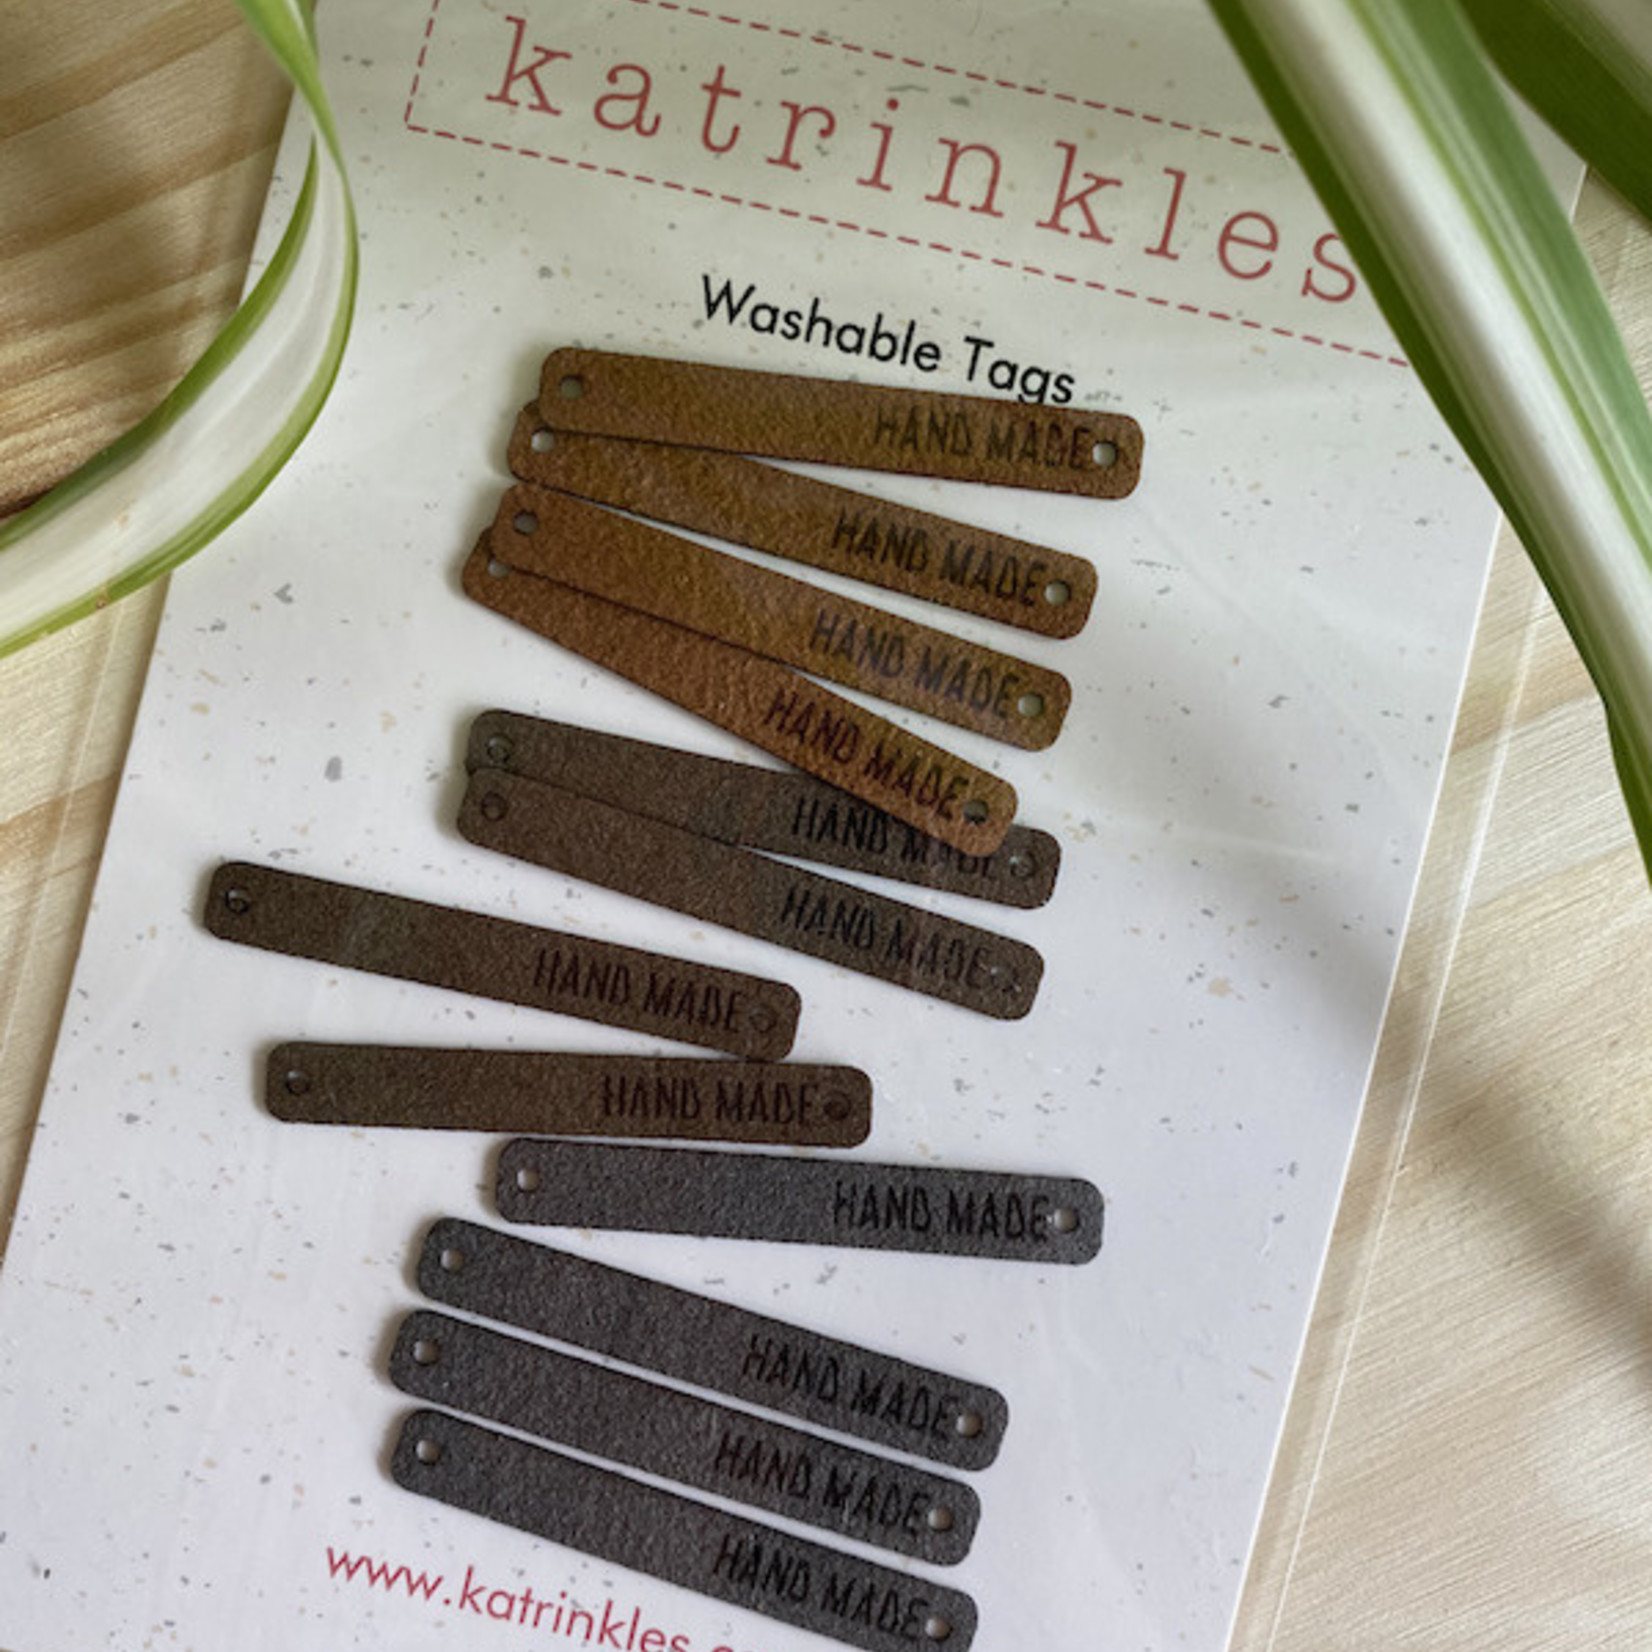 Katrinkles Foldover Hand Knit Tag